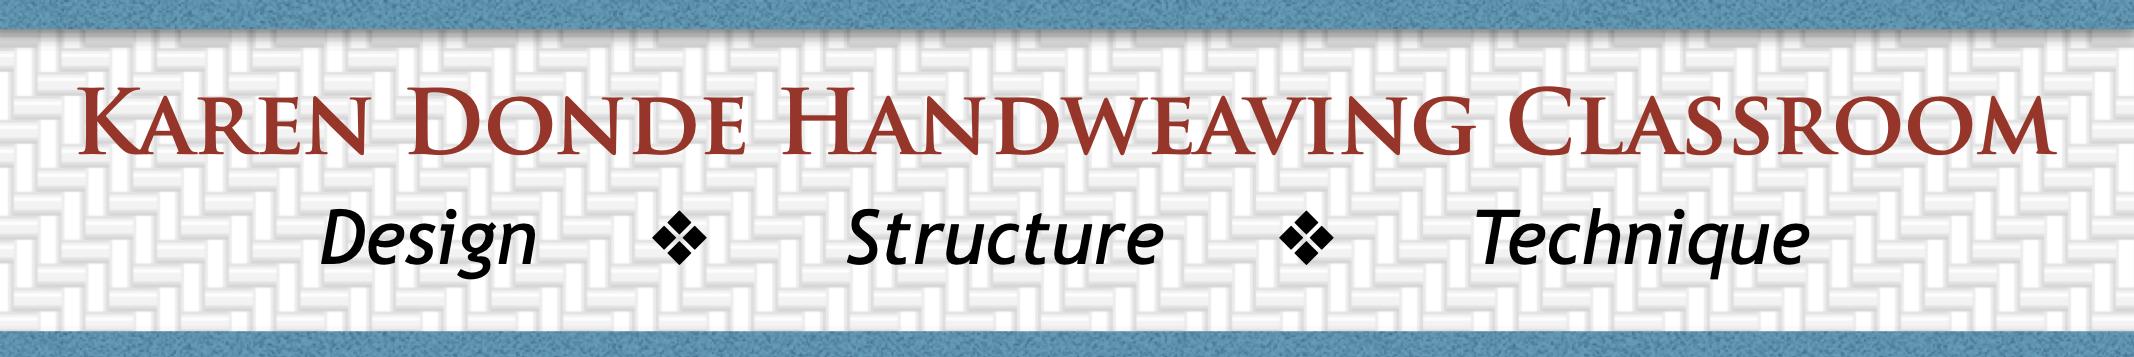 Karen Donde Handweaving Classroom logo: Design Structure Technique